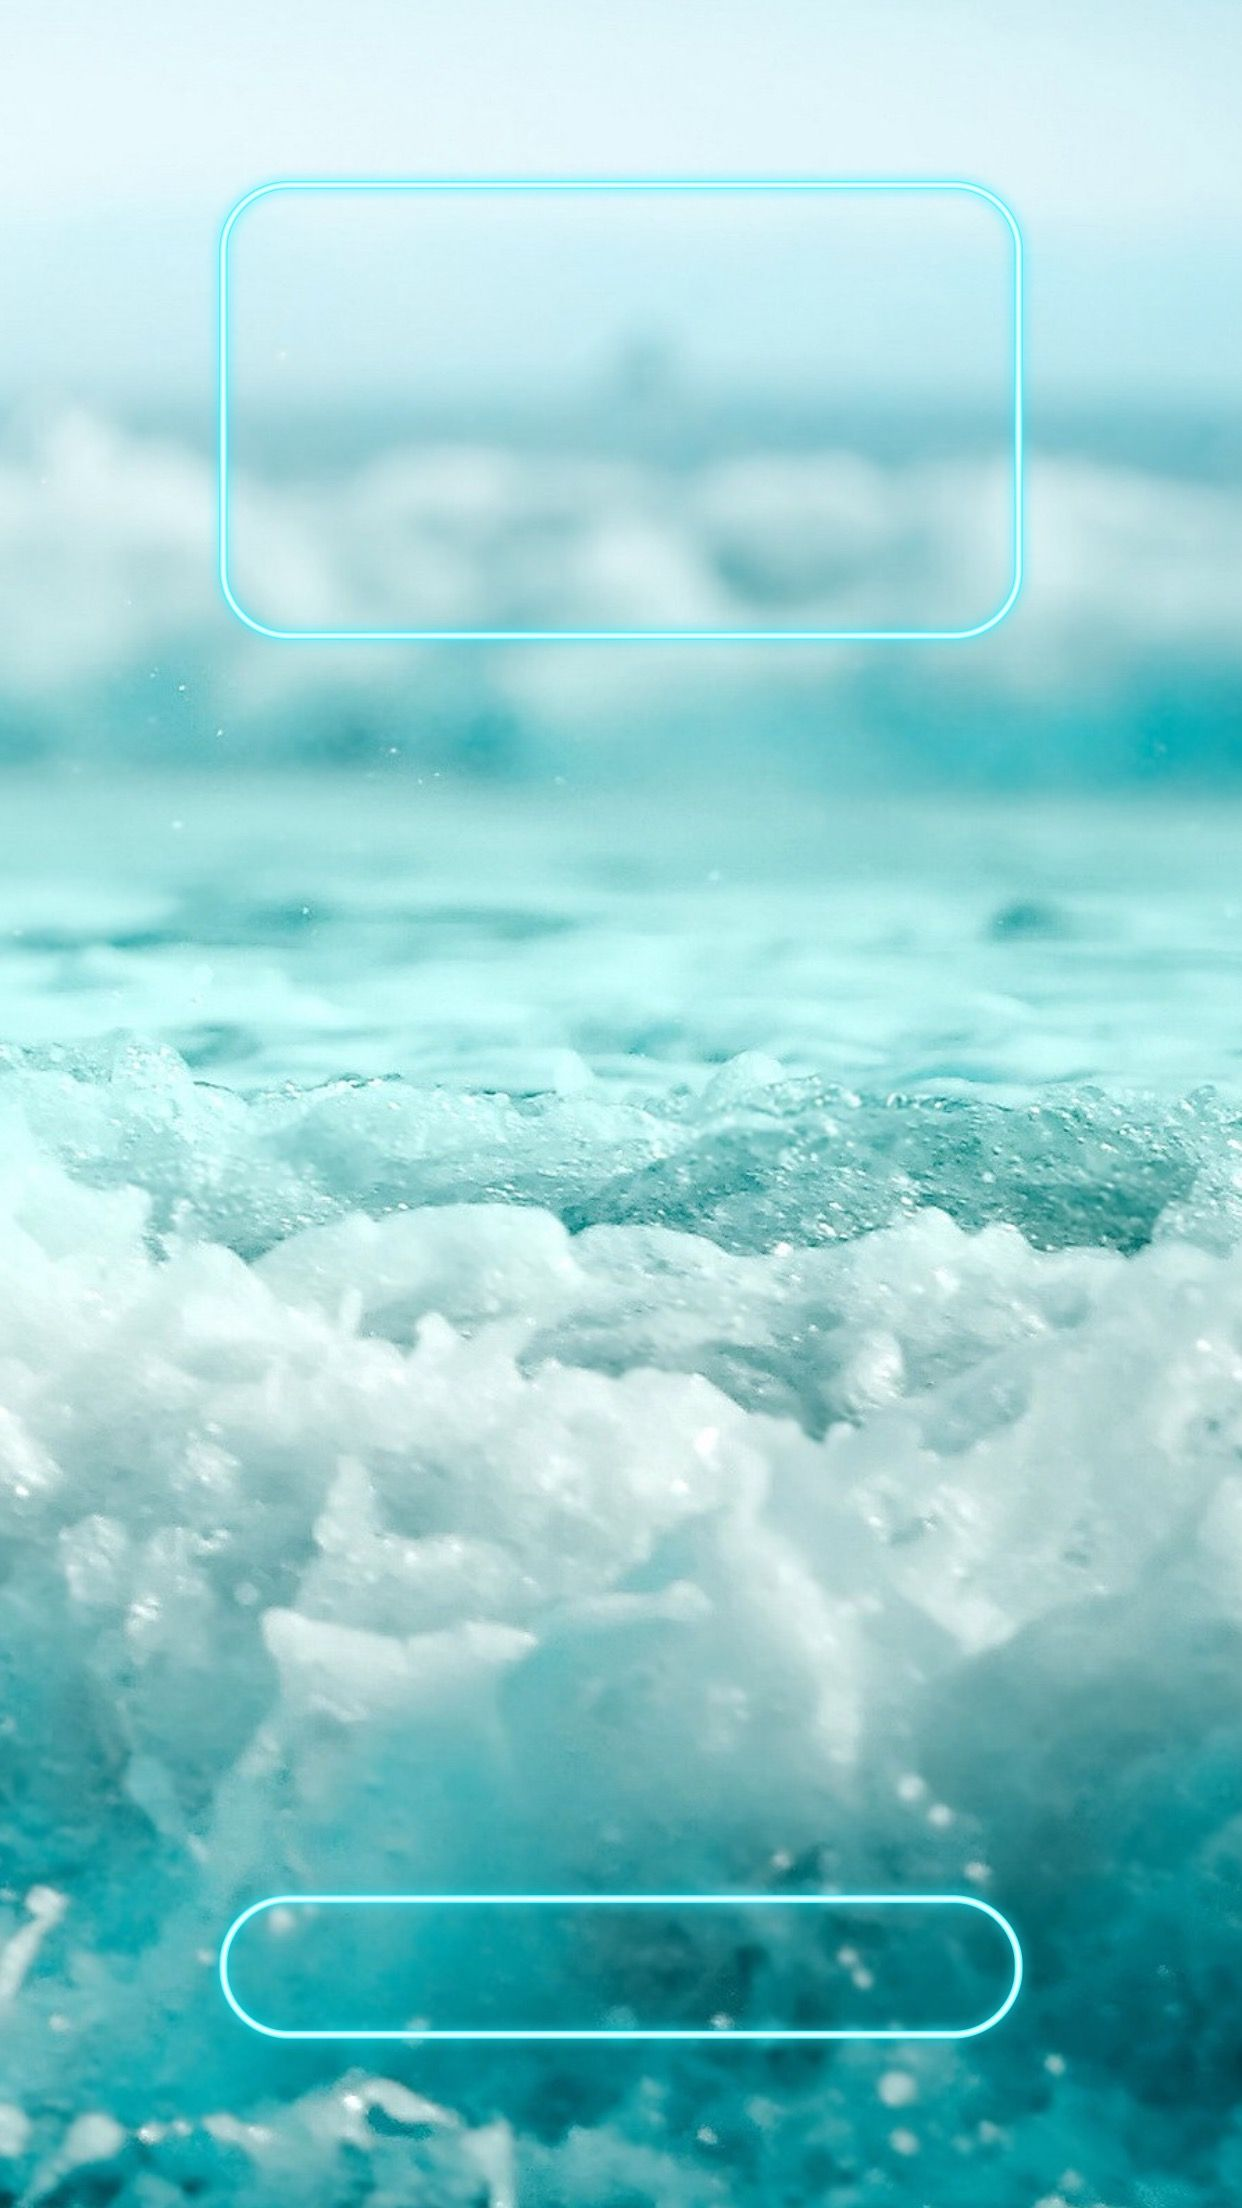 Sea Wallpaper 4k Phone - HD Wallpaper